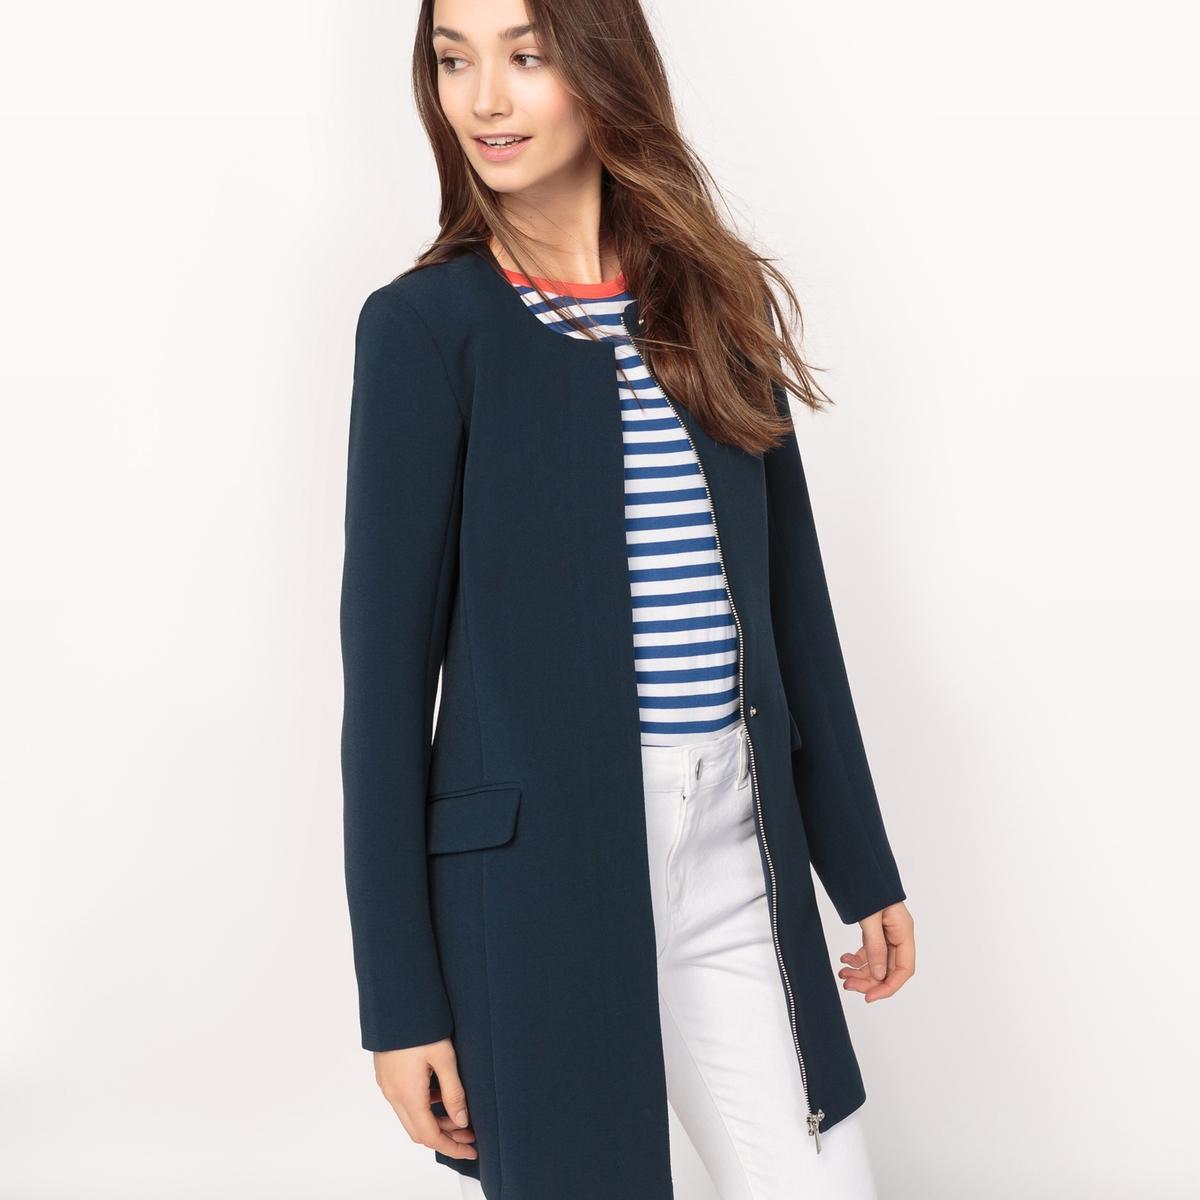 Пальто прямого покроя без воротника